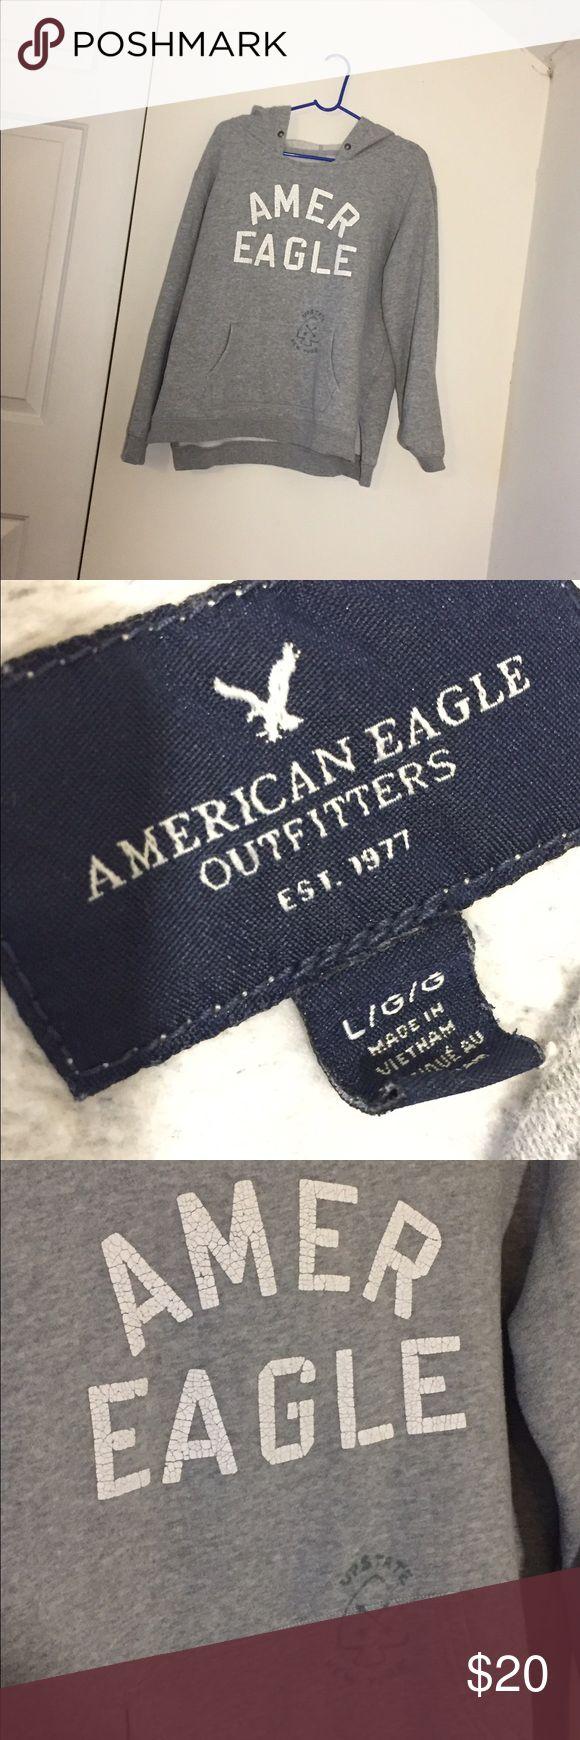 American eagle sweatshirt Gray American eagle sweatshirt with hood American Eagle Outfitters Tops Sweatshirts & Hoodies